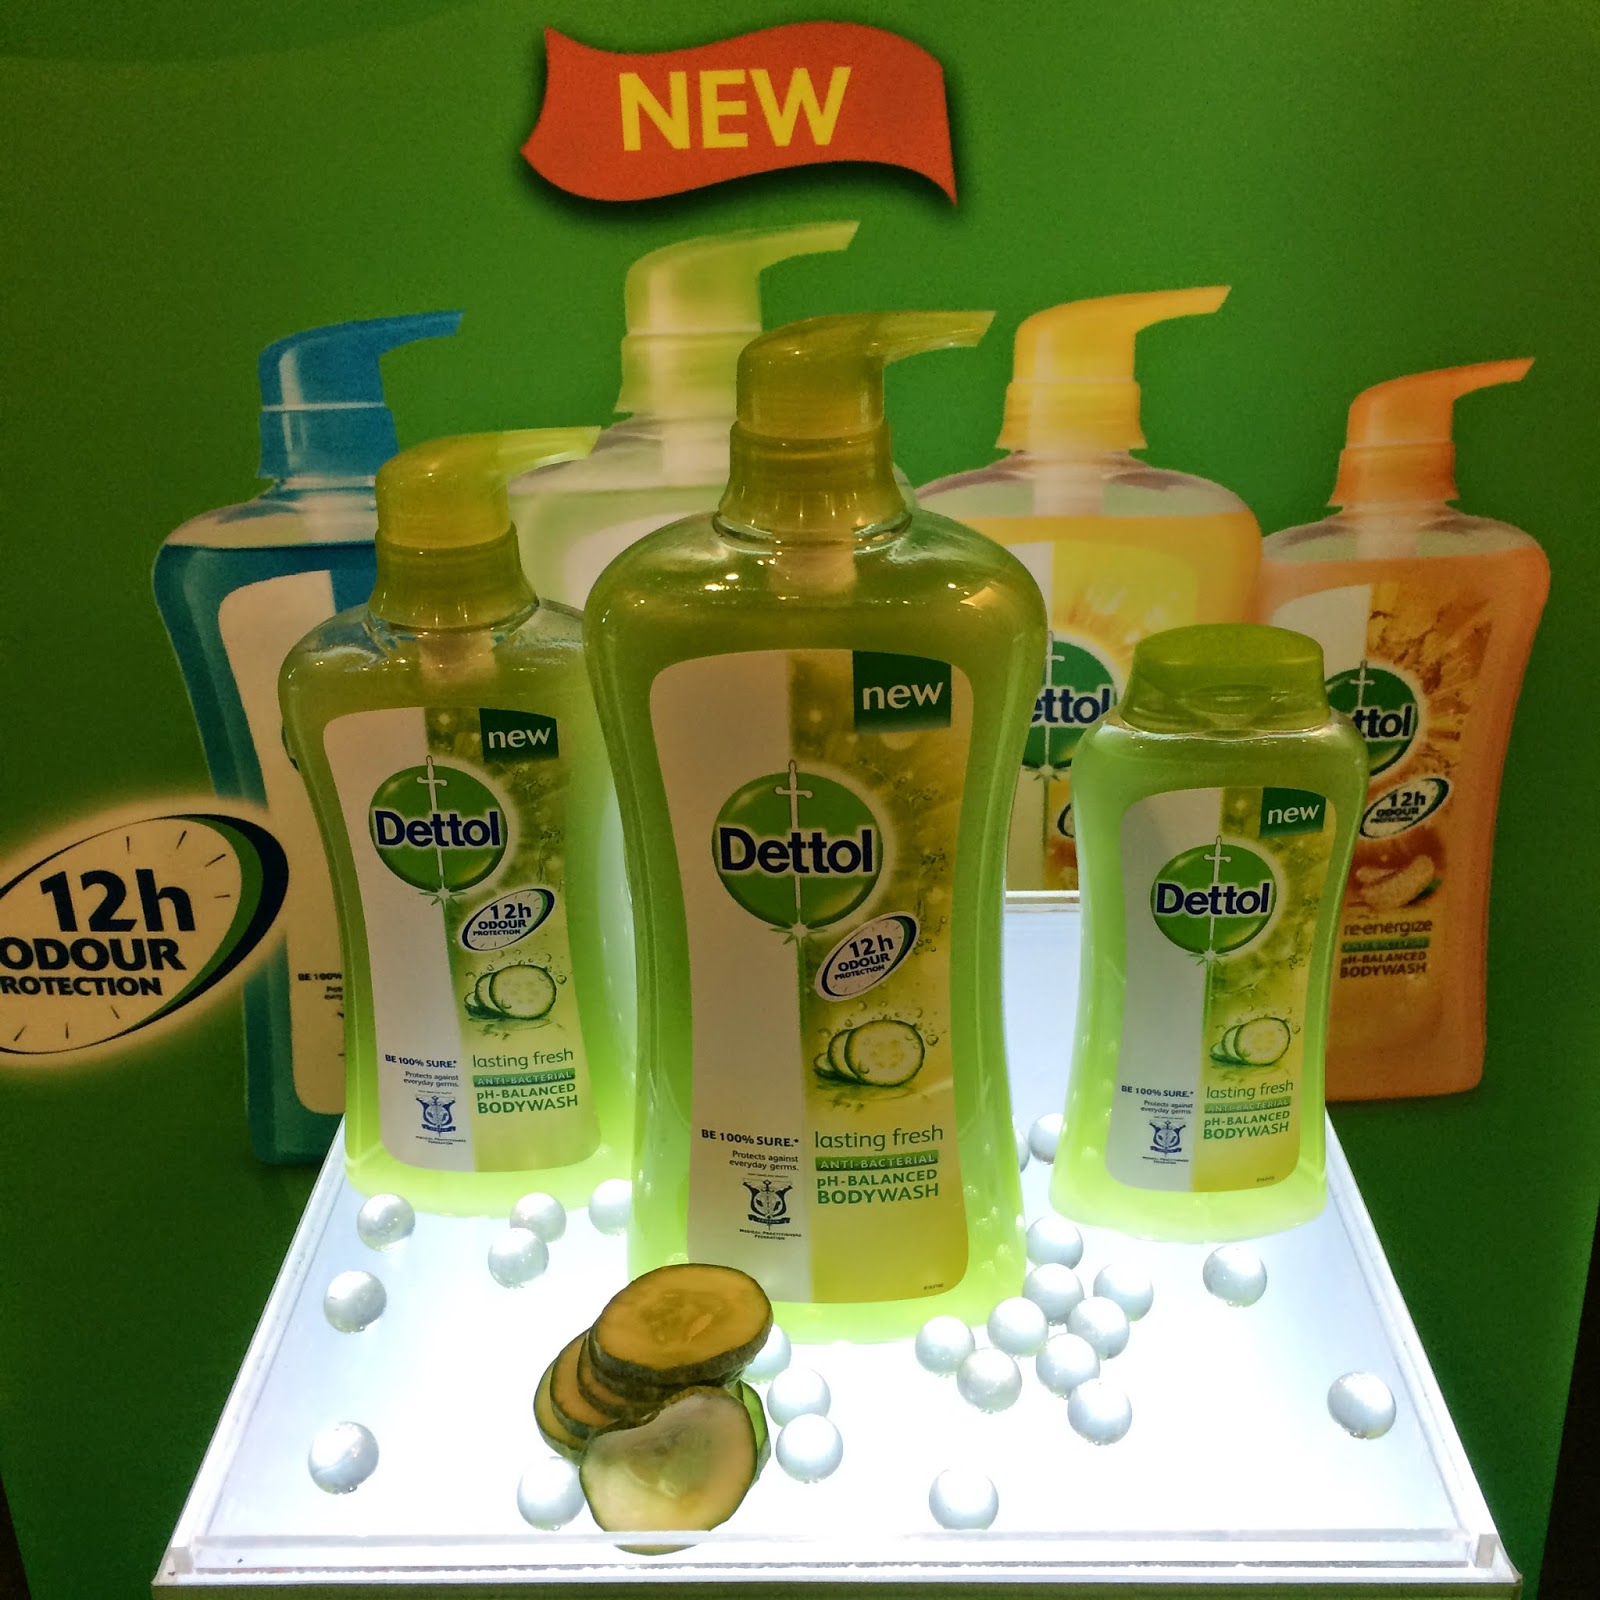 Body Wash yang dirumus khas untuk mencegah bakteria dan mengekalkan keharuman sehingga 12 jam perlindungan Untuk produk terbaru Dettol ini ianya